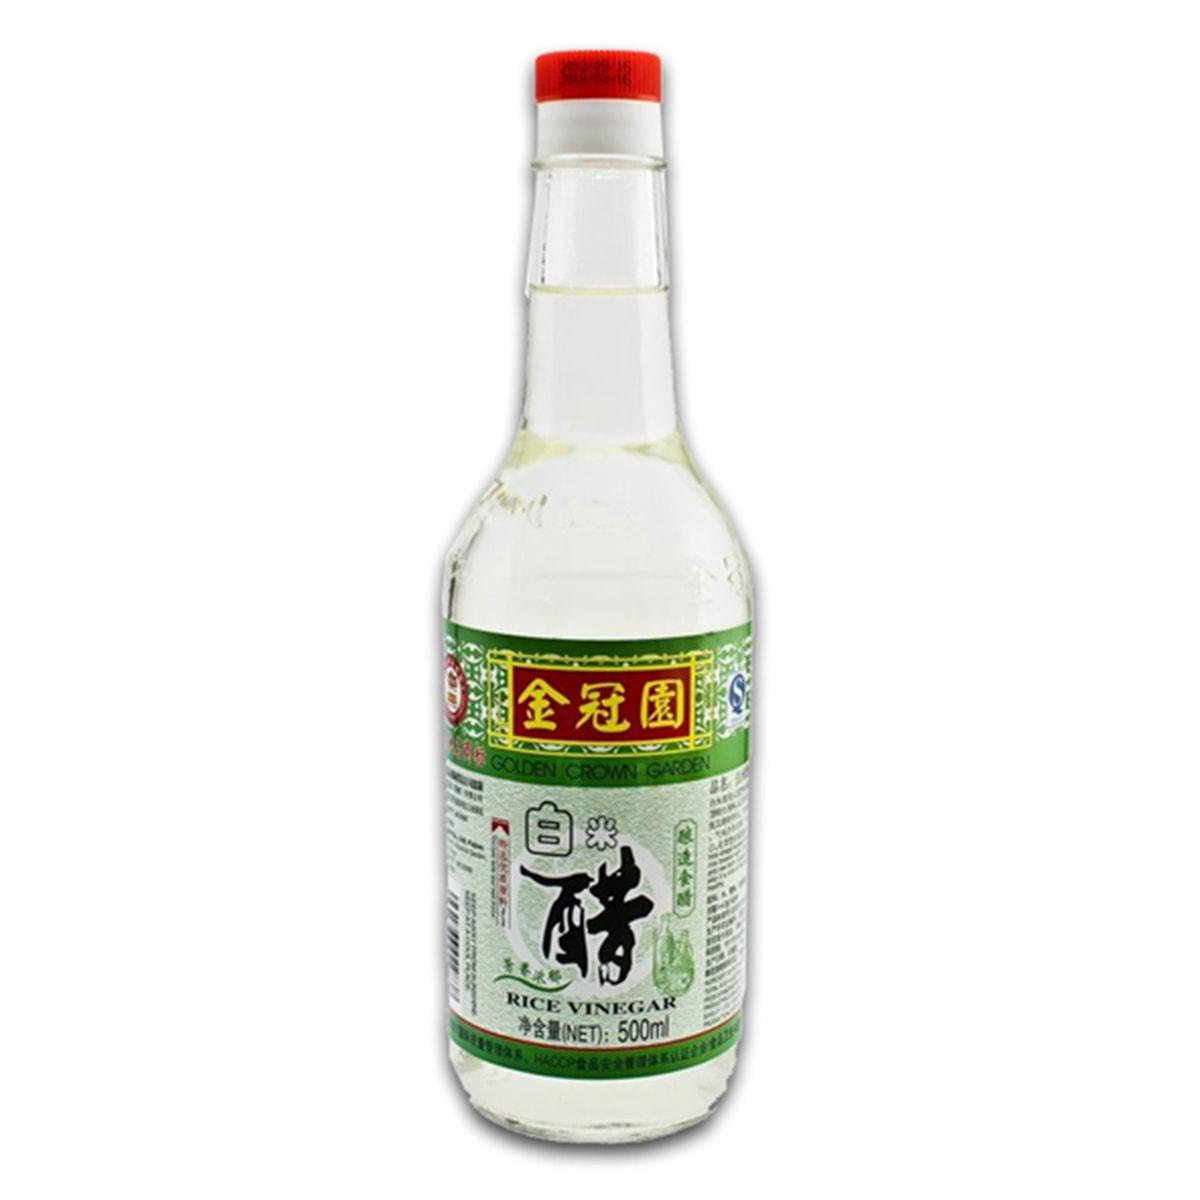 Buy Golden Crown Garden Rice Vinegar - 500 ml